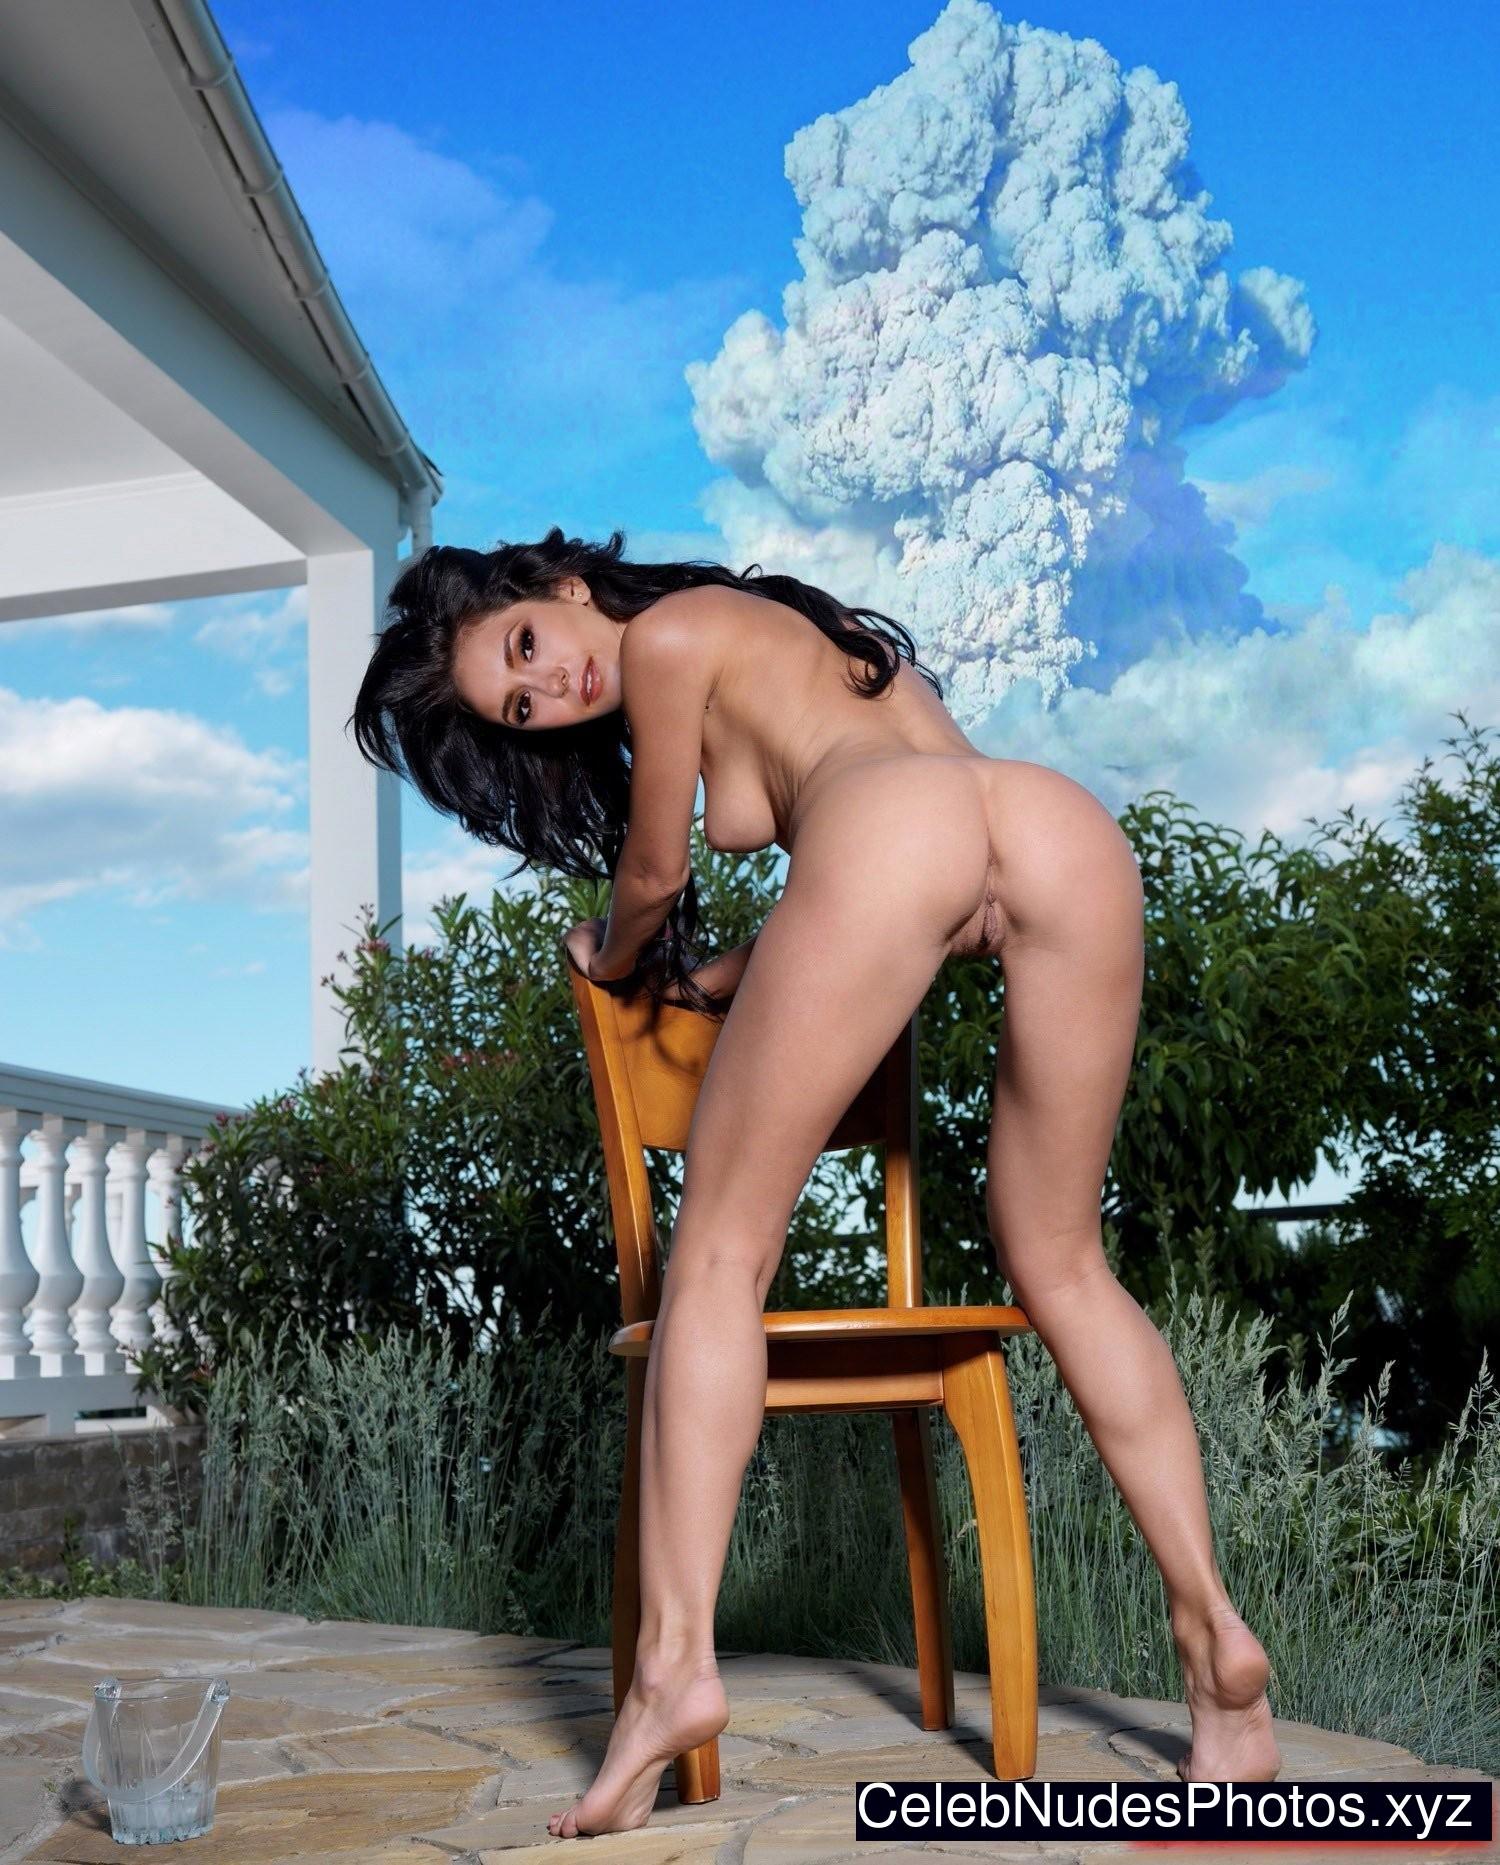 Elana dobrev nude